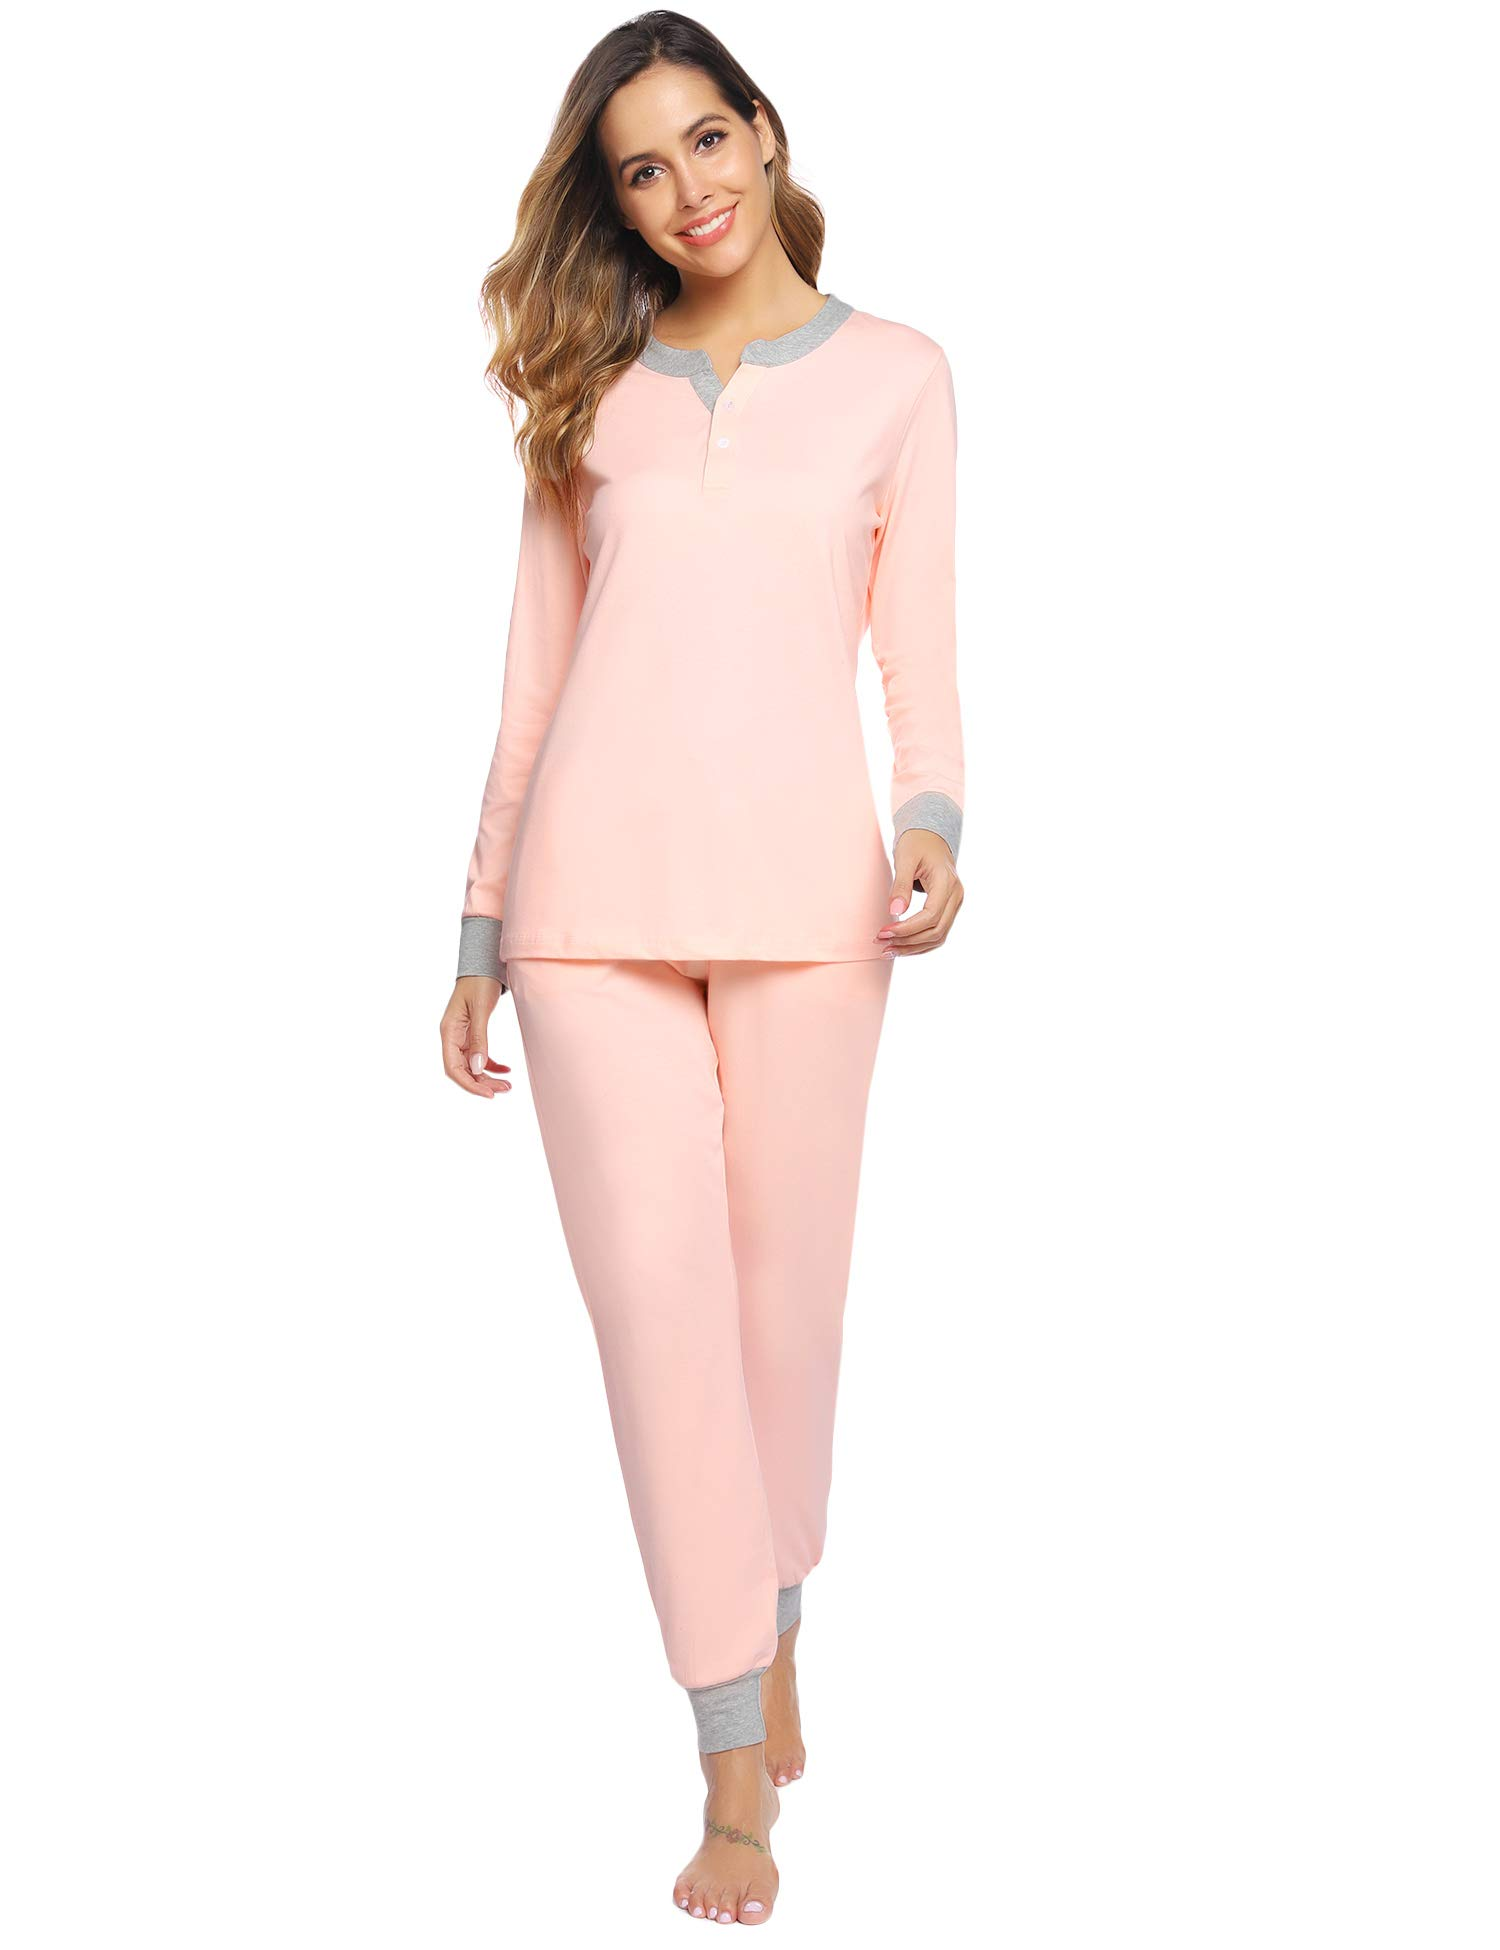 Aibrou Womens Cotton Pajama Set Long Sleeve Sleepwear Lounge wear Pjs Set